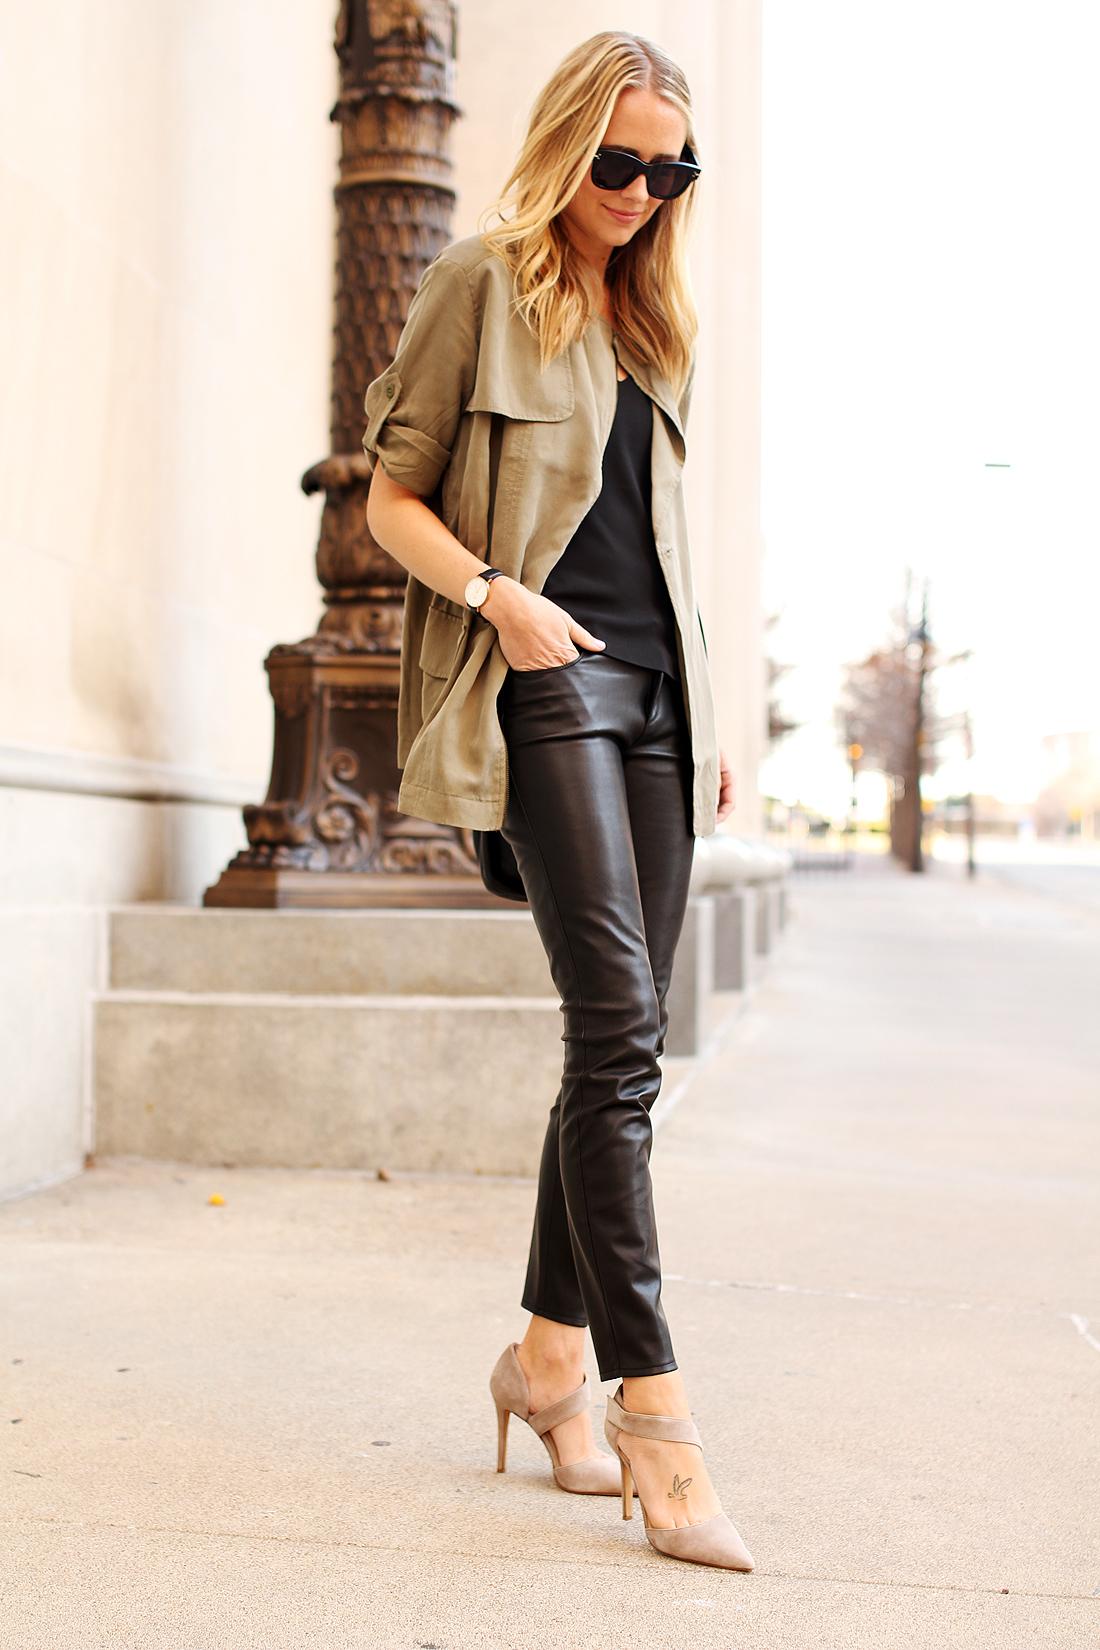 1447bdc565092d UTLITY JACKET & FAUX LEATHER PANTS.  fashion-jackson-banana-republic-drapey-drawstring-jacket-black-